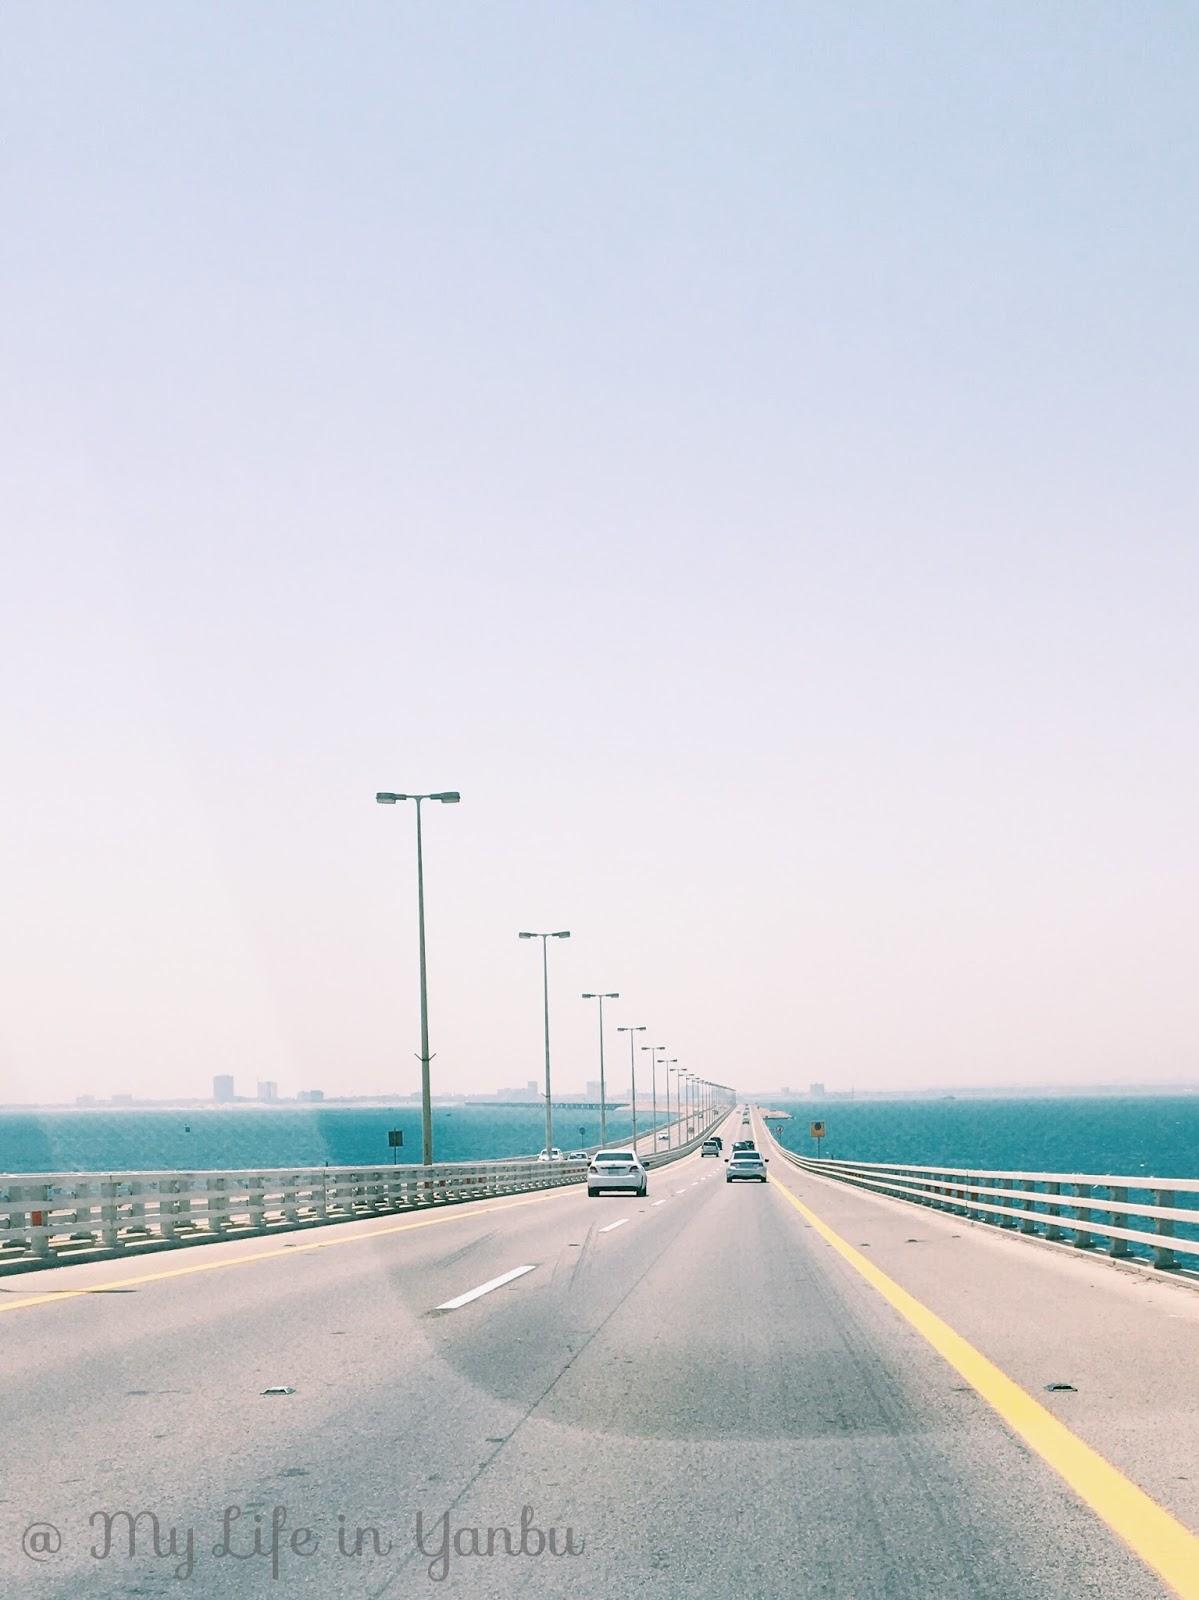 King Fahd Causeway